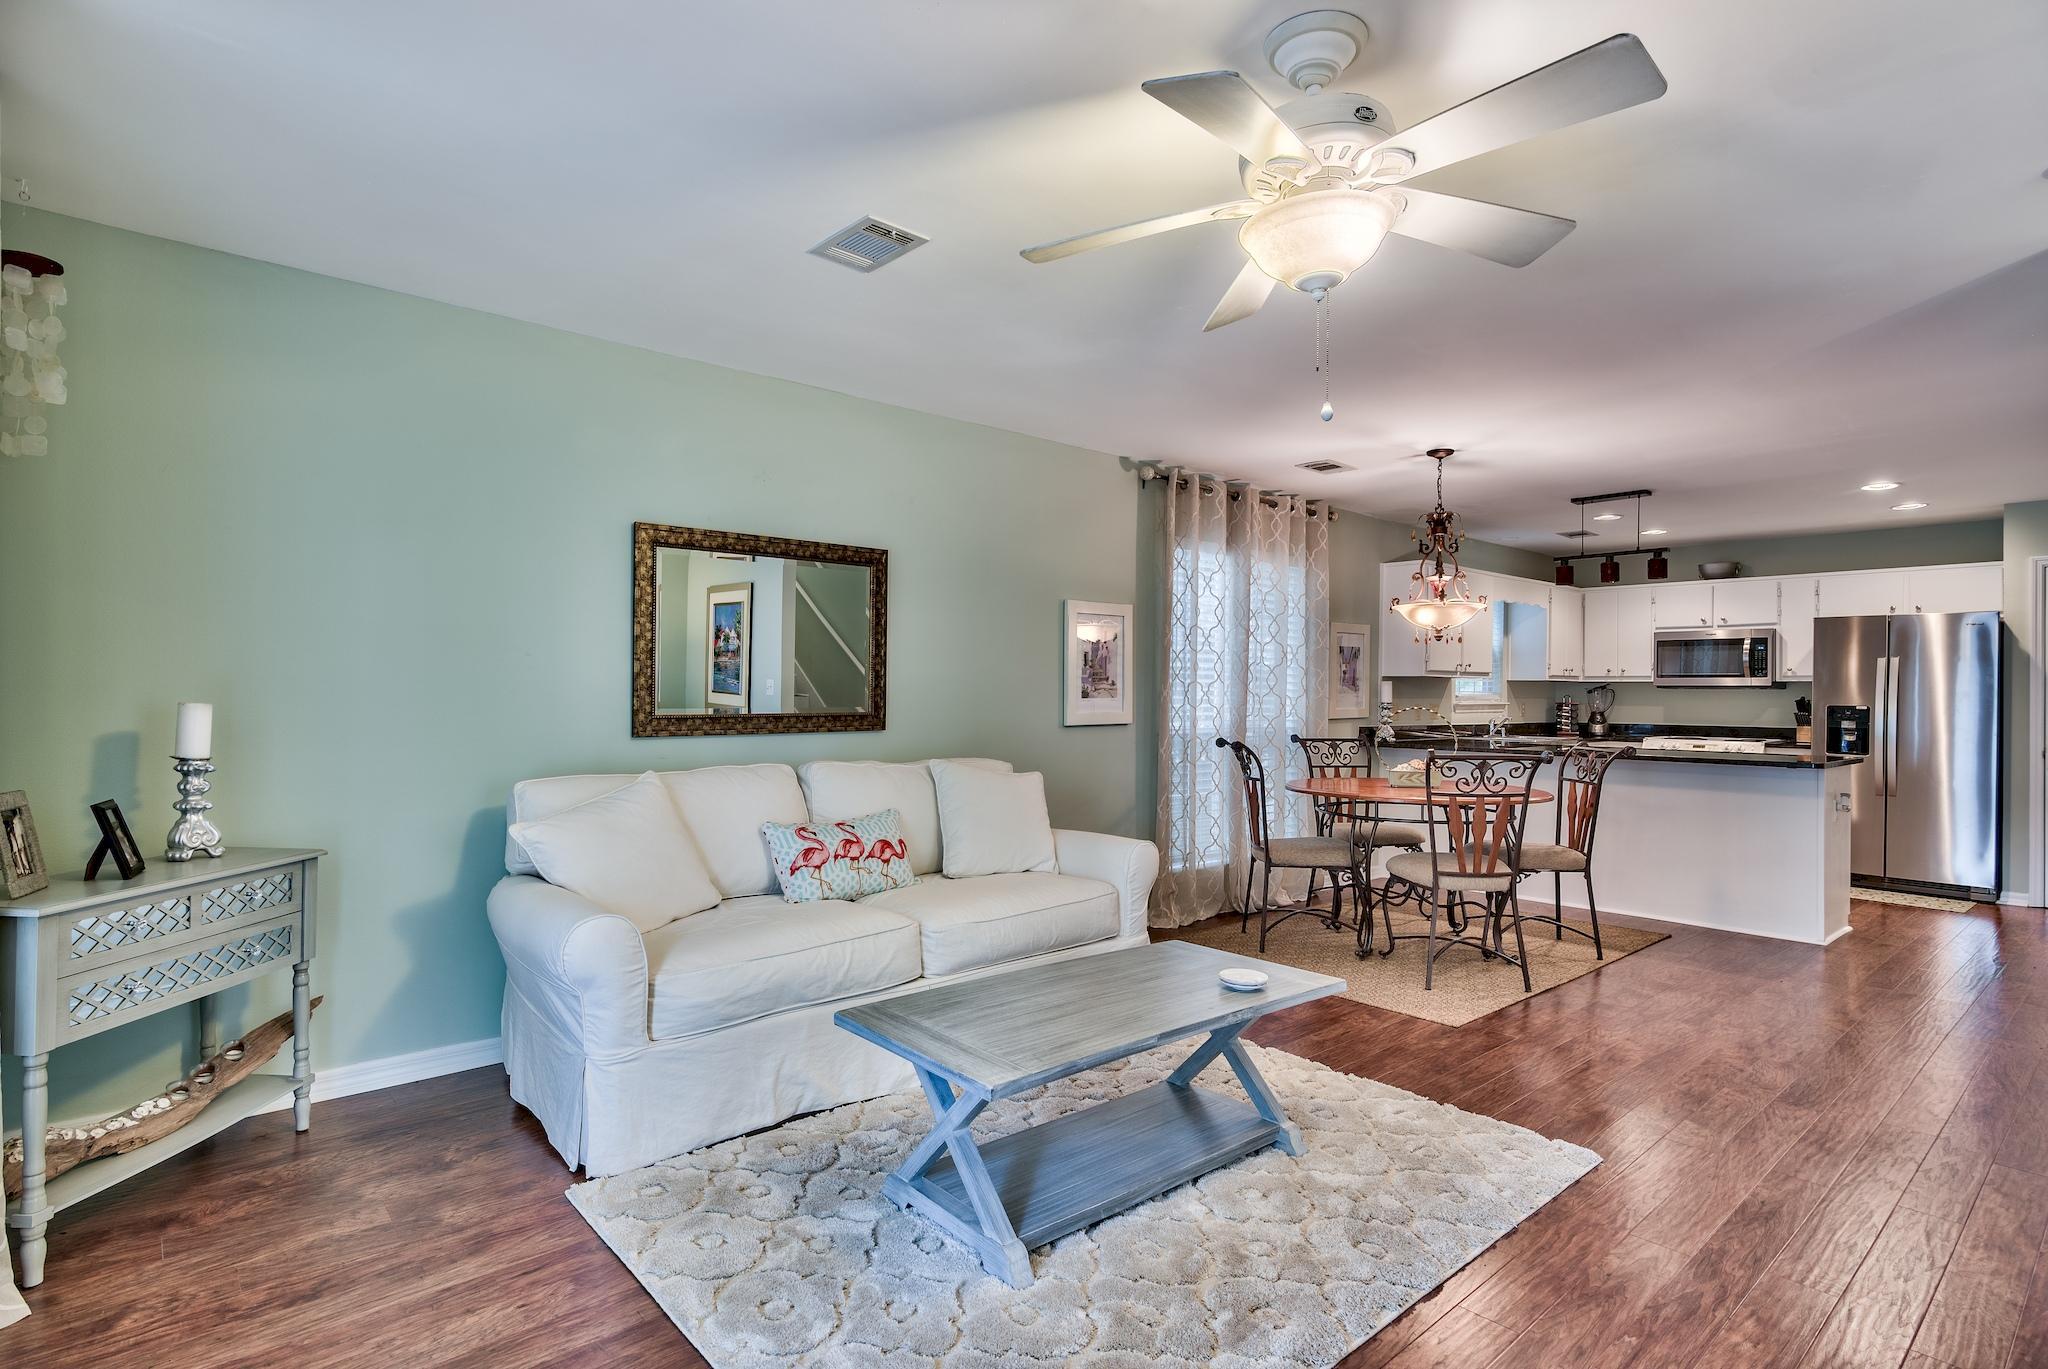 A 2 Bedroom 2 Bedroom Blue Gulf Resort Home